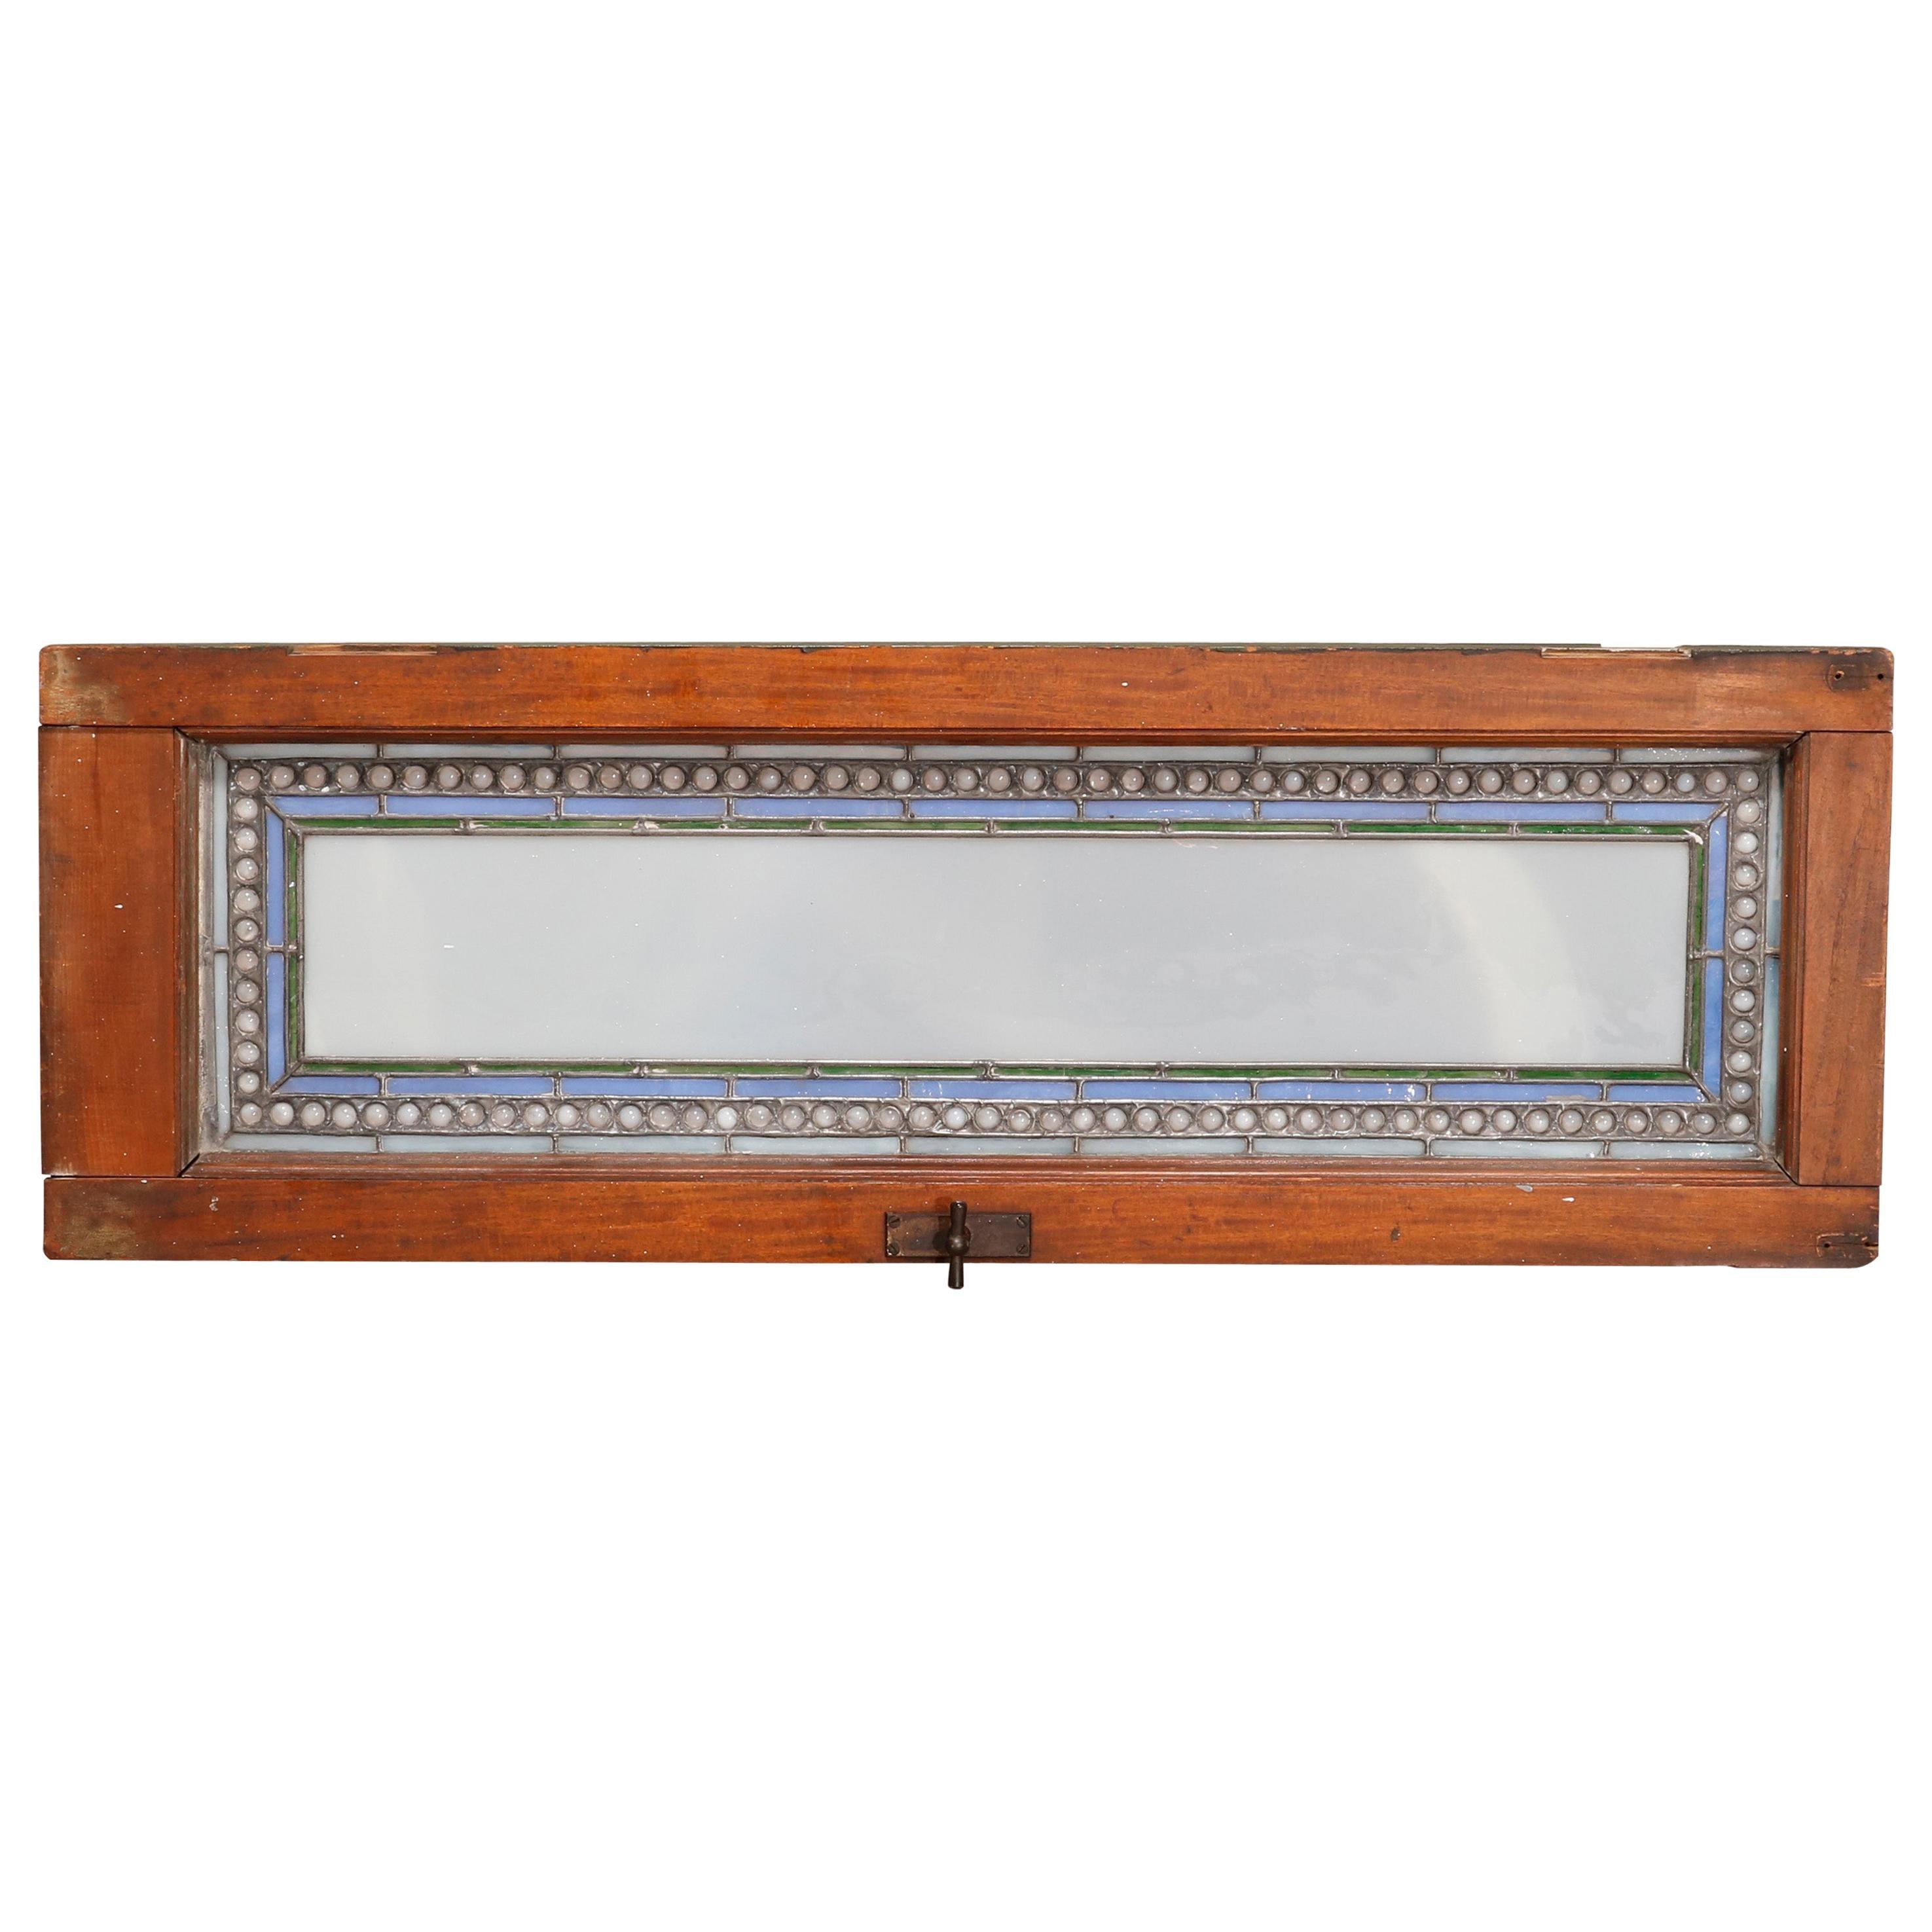 Antique Arts & Crafts Frank Lloyd Wright Style Leaded Glass Long Window c1910